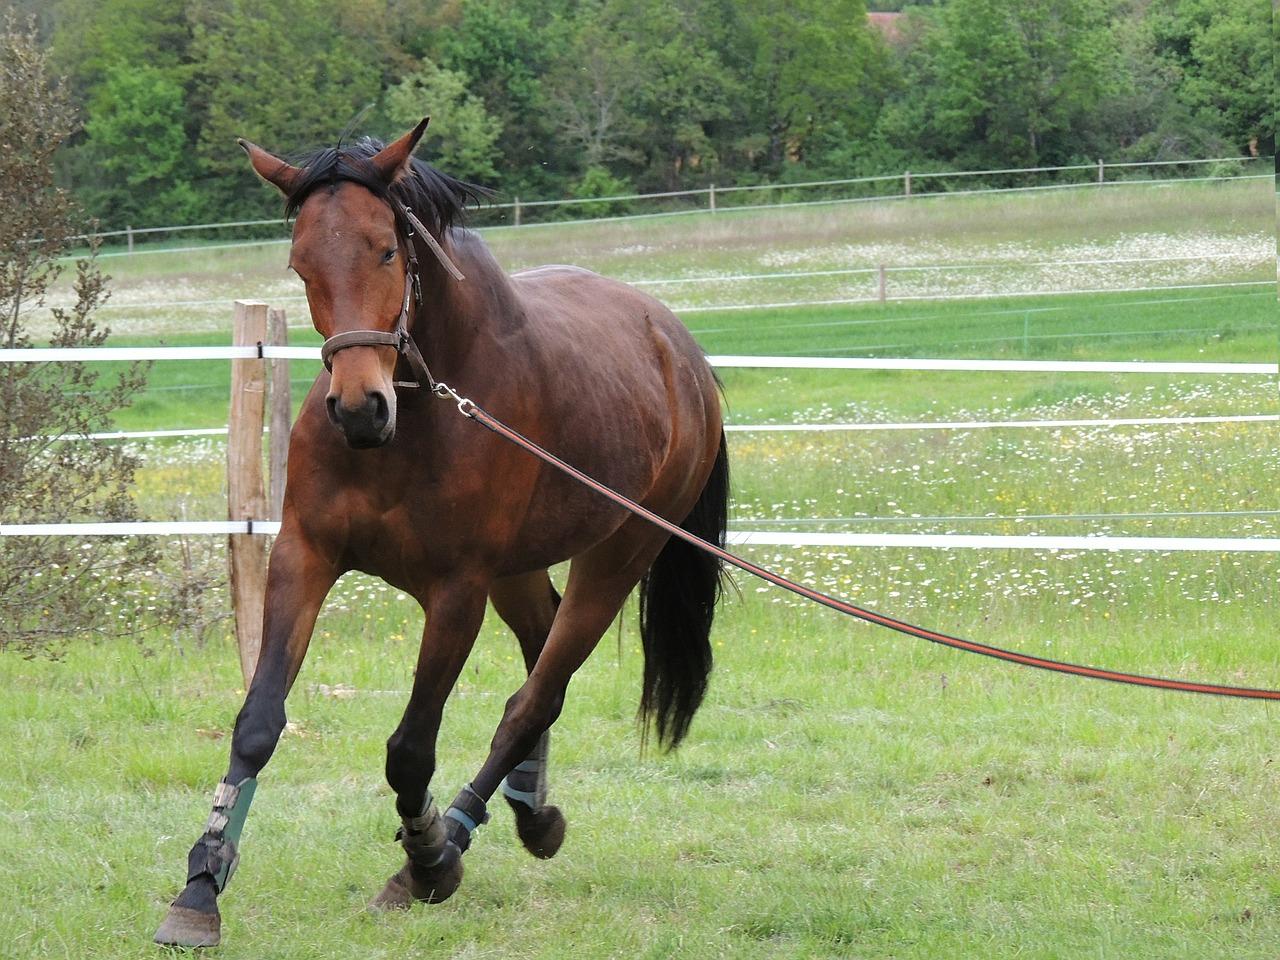 horseback-riding-364241_1280